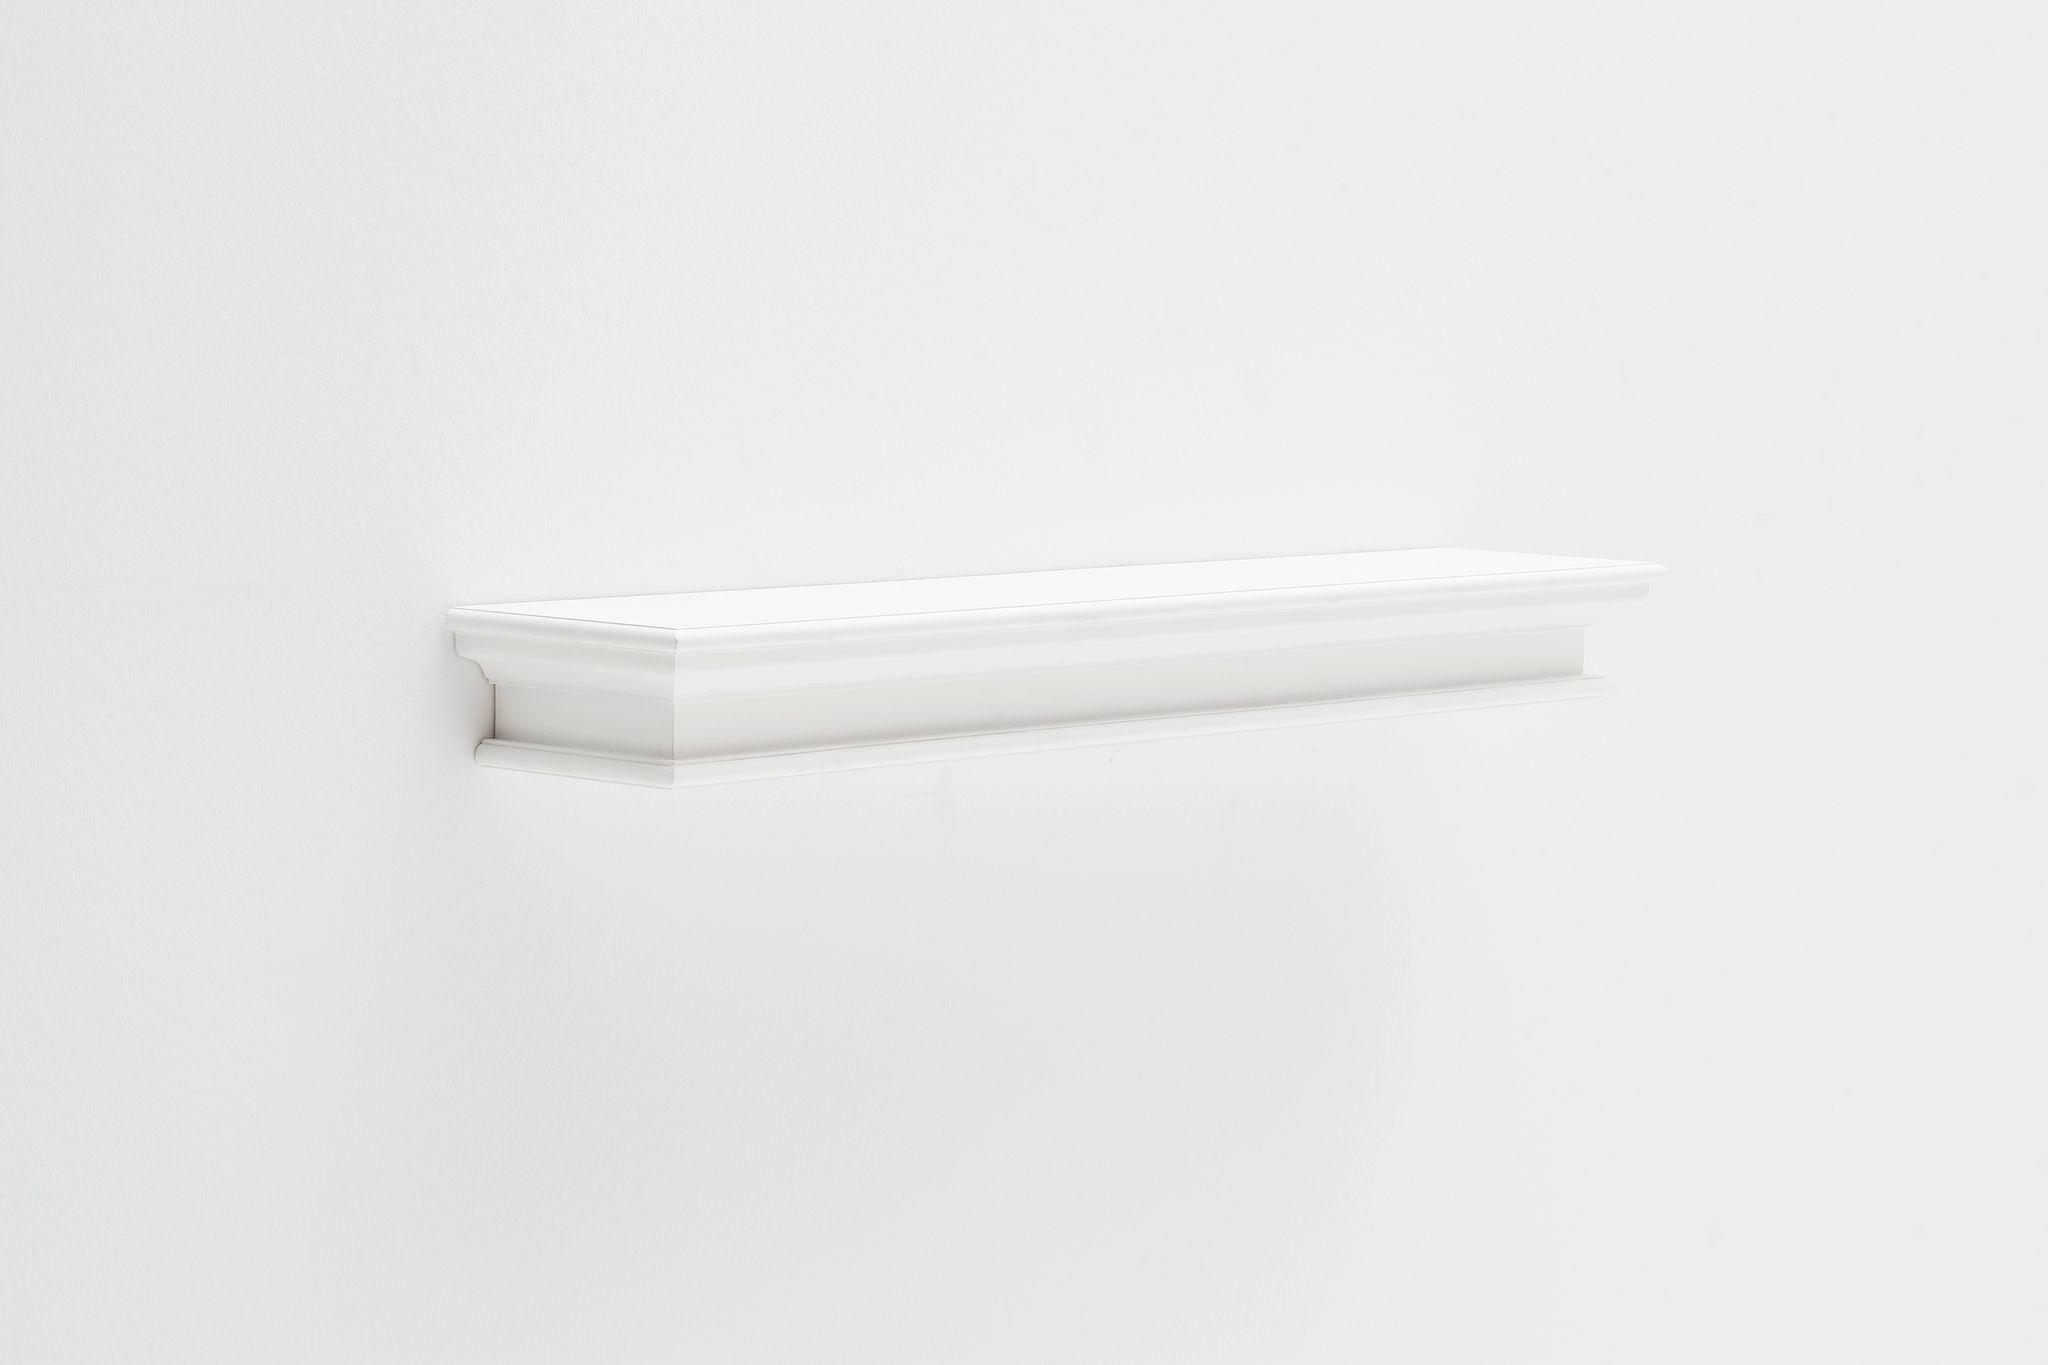 Floating Wall Shelf, Extra Long